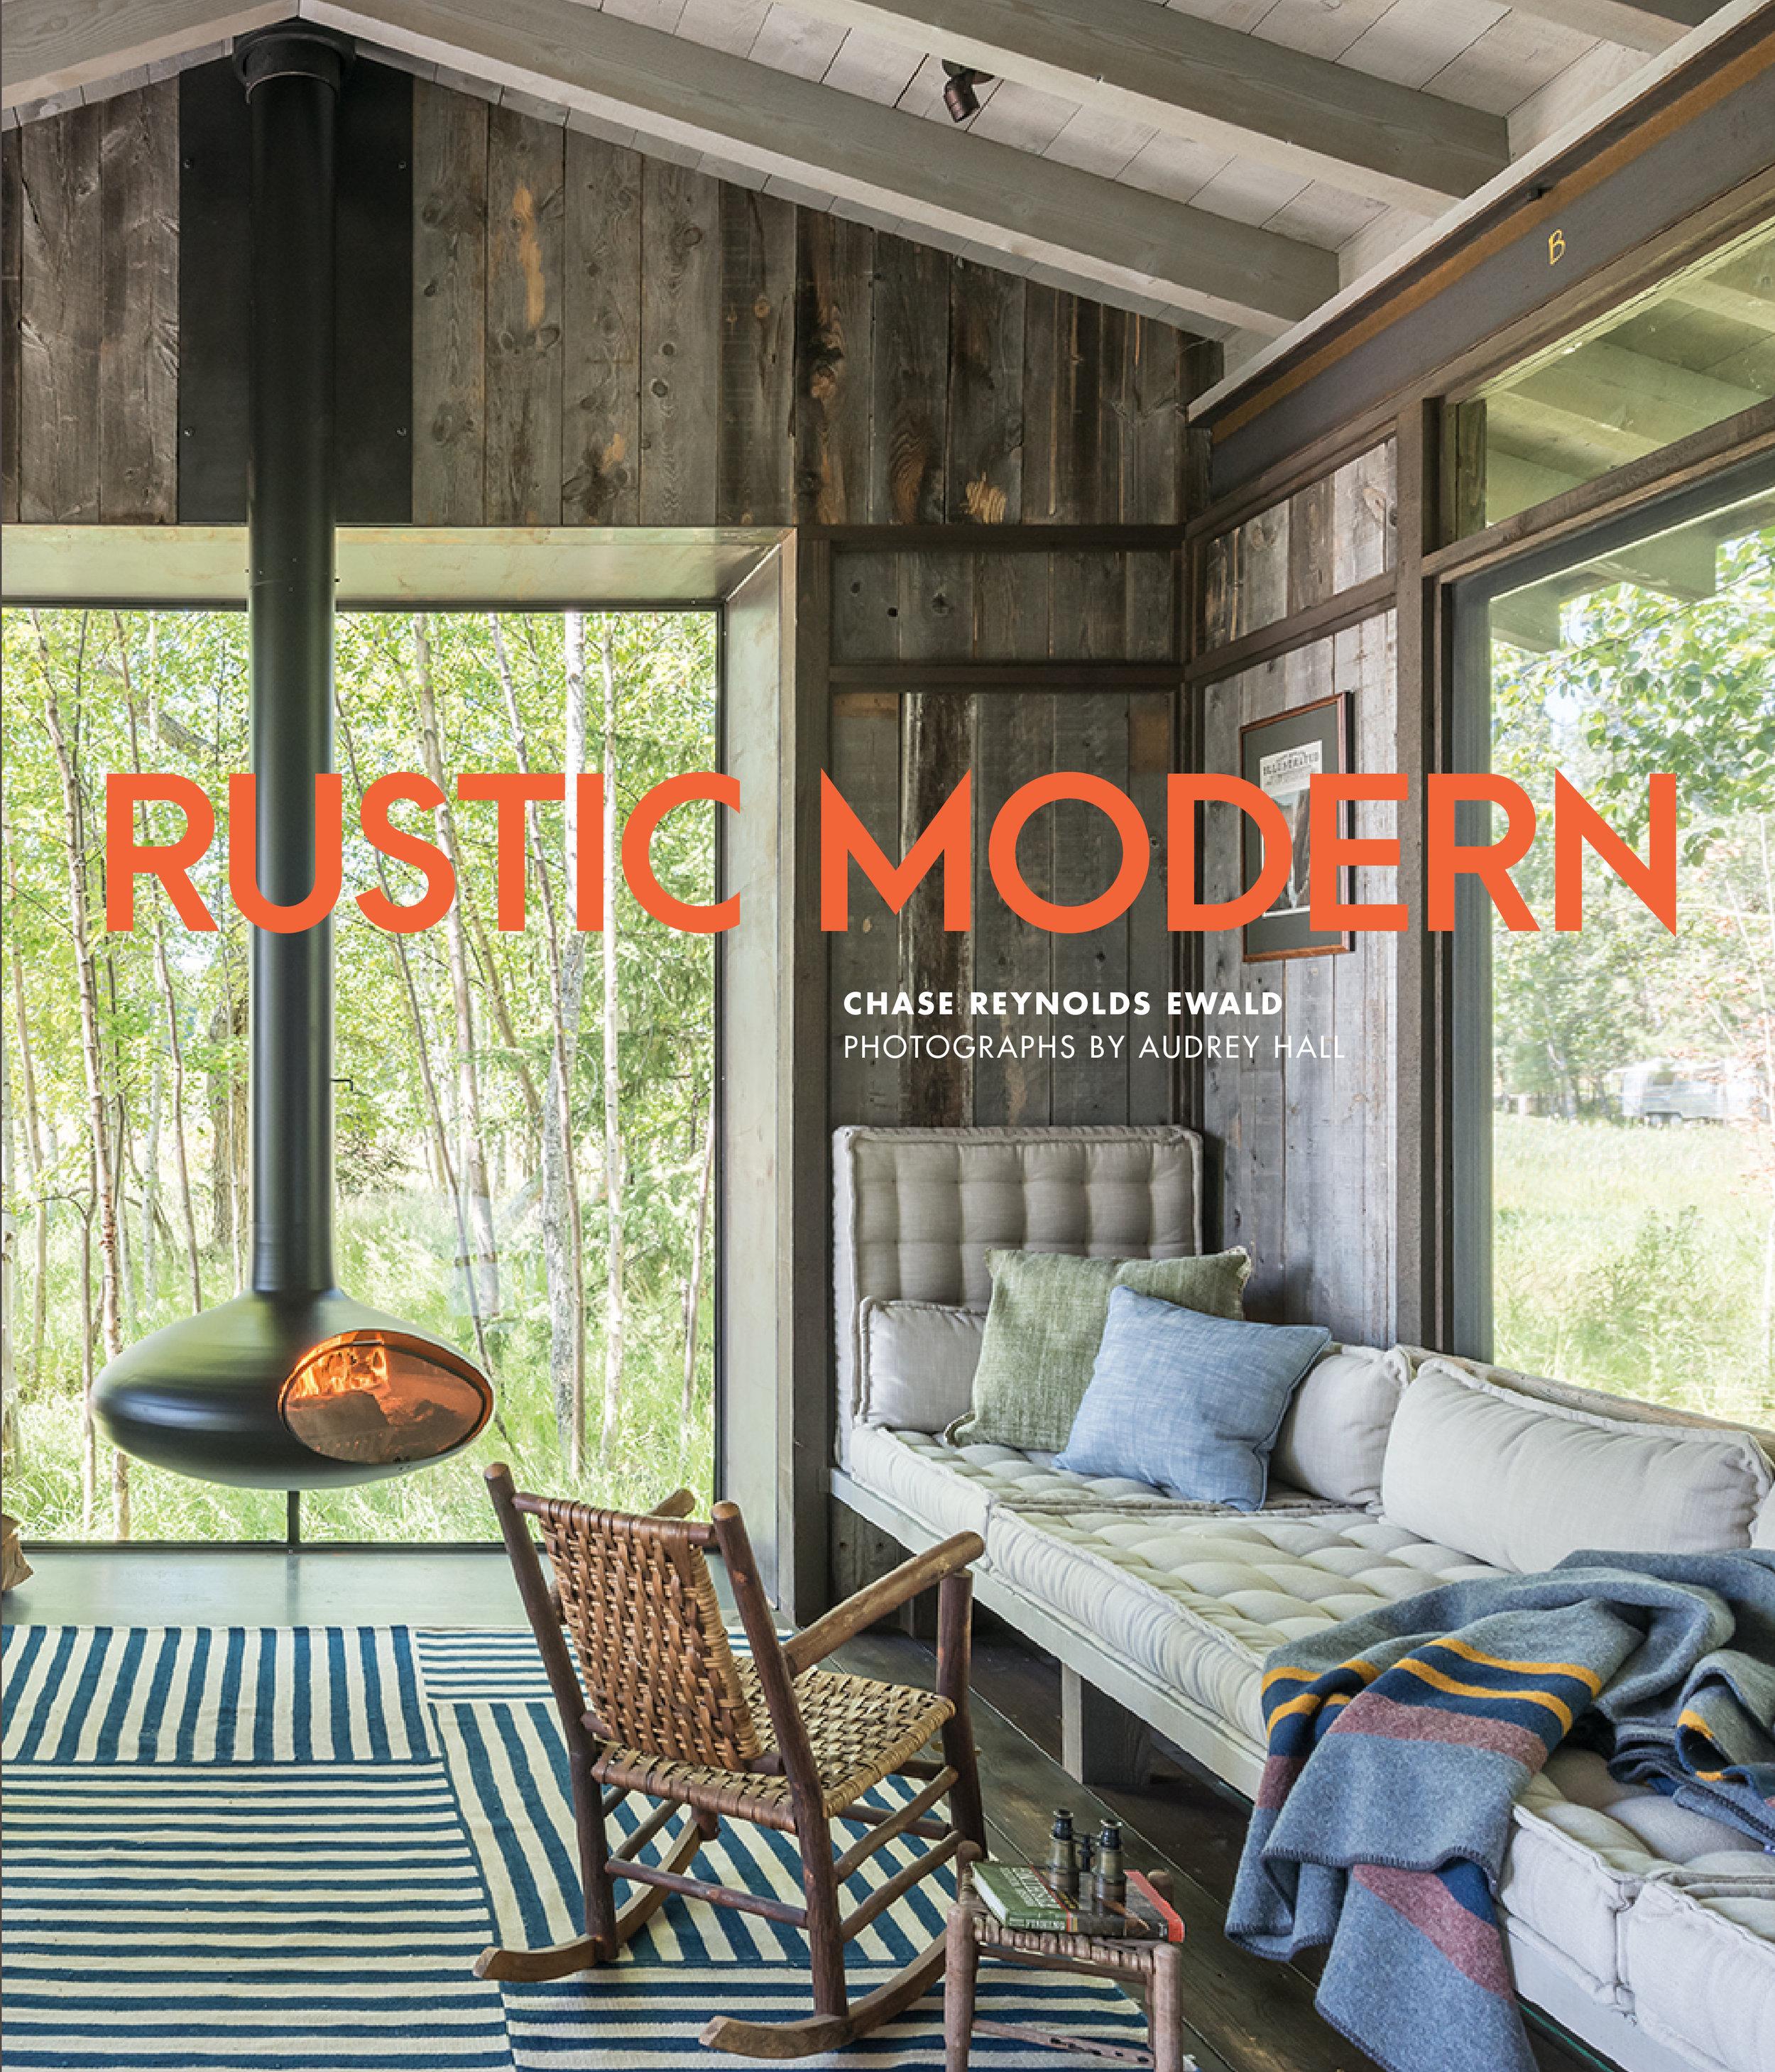 Rustic Modern.jpg